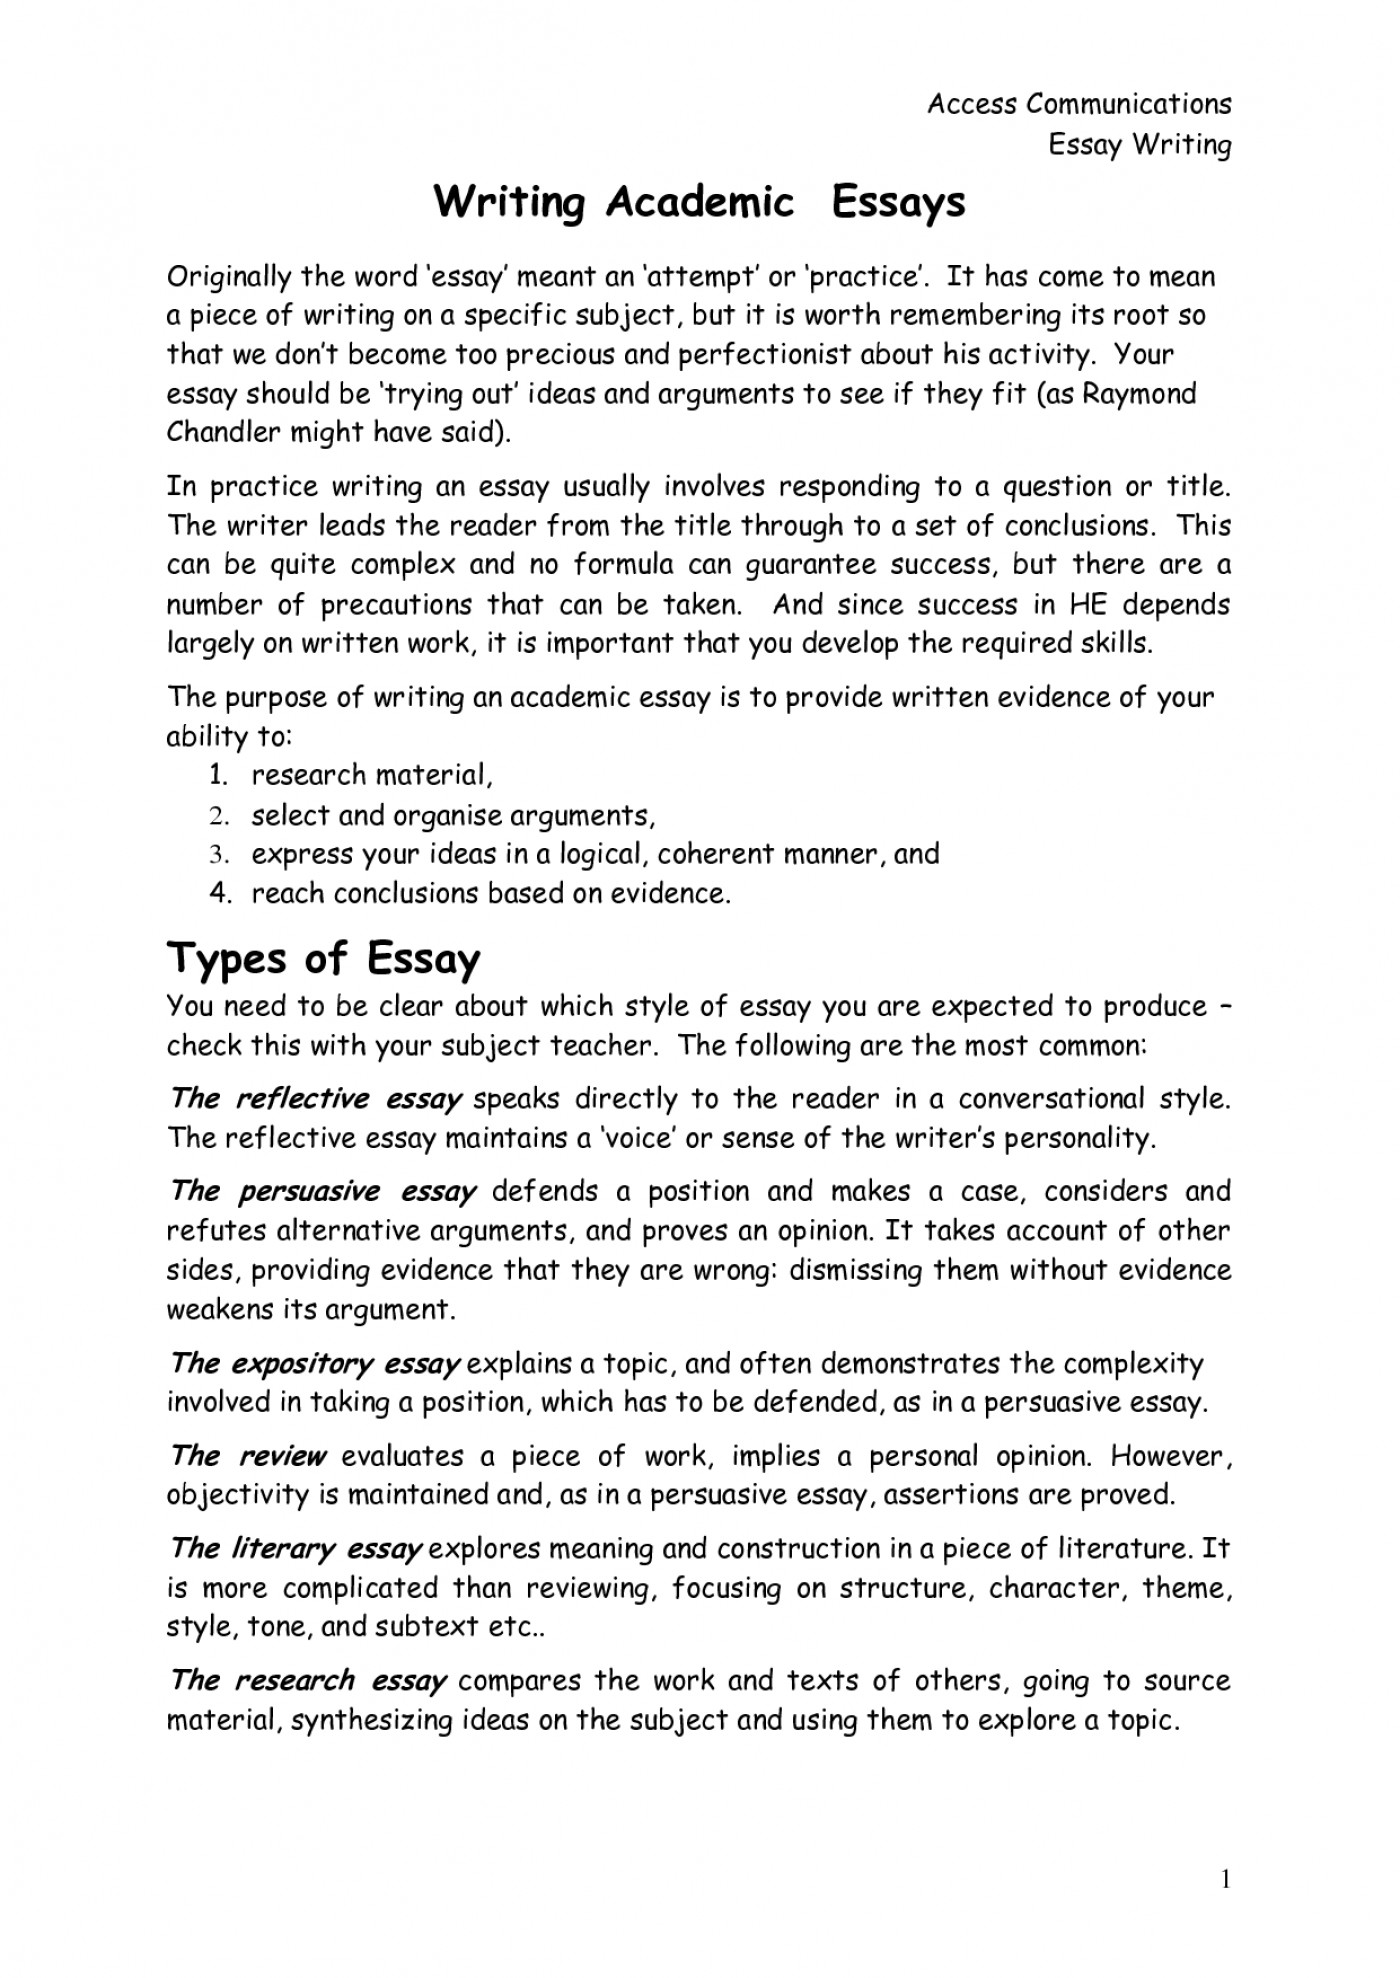 Community service essay student essays summary